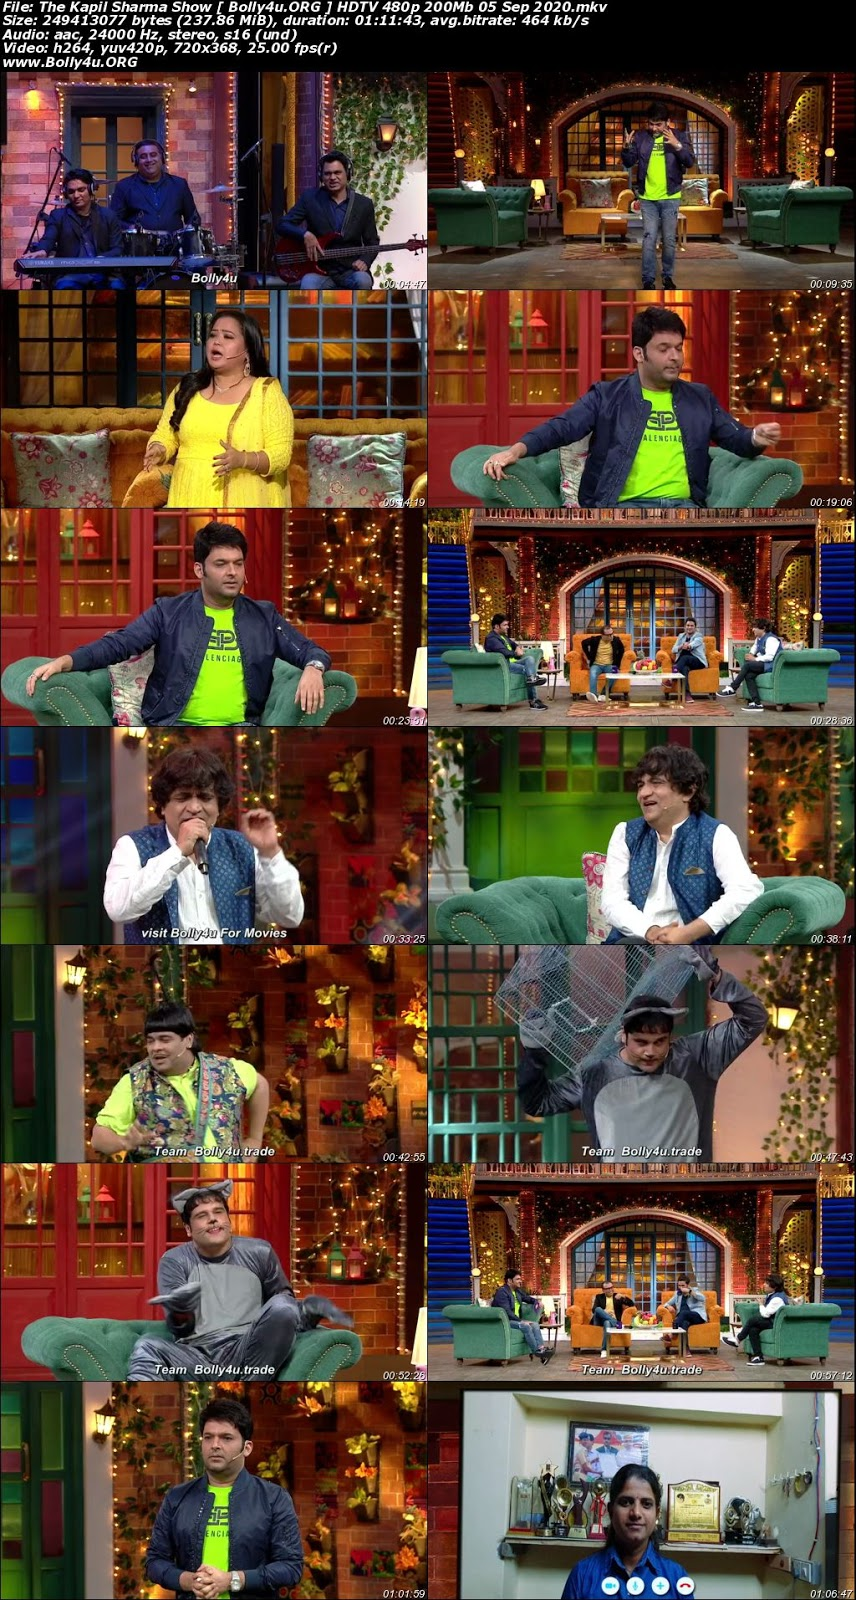 The Kapil Sharma Show HDTV 480p 200MB 05 September 2020 Download